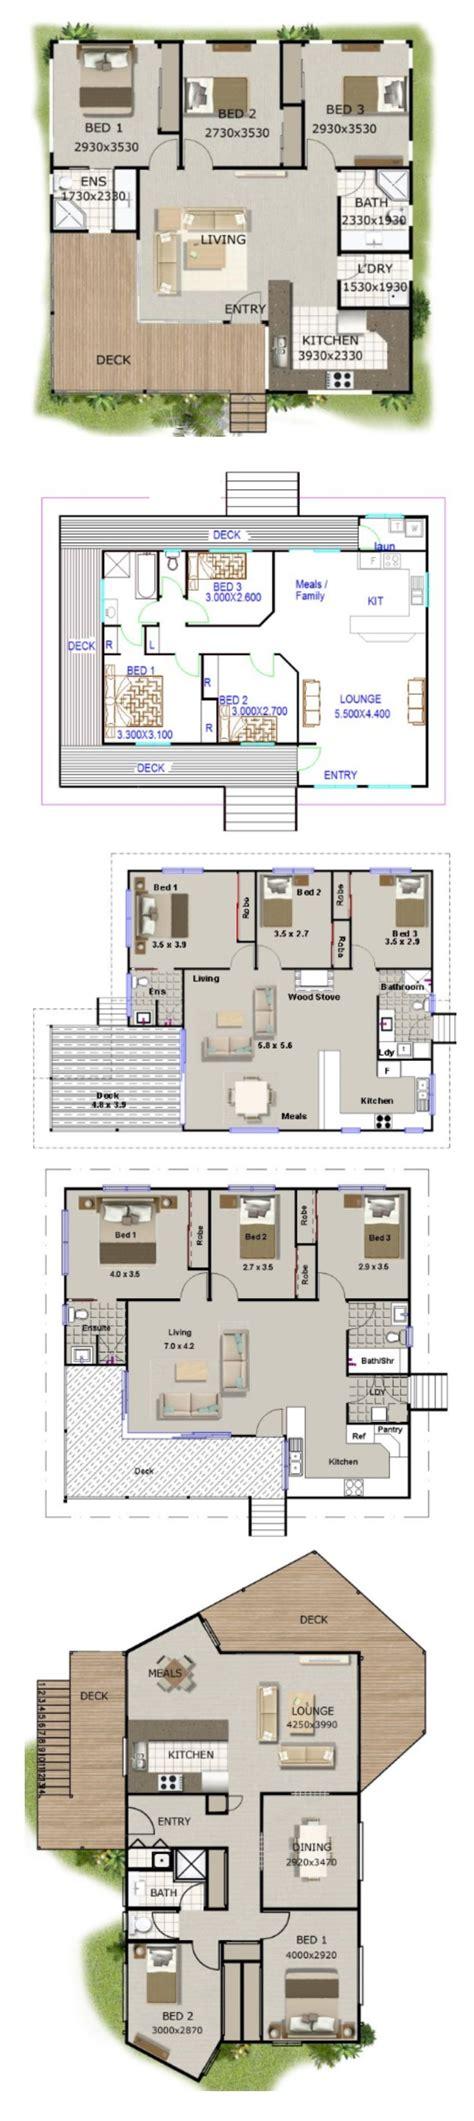 floor plans for adding onto a house floor plans for adding onto a house image collections